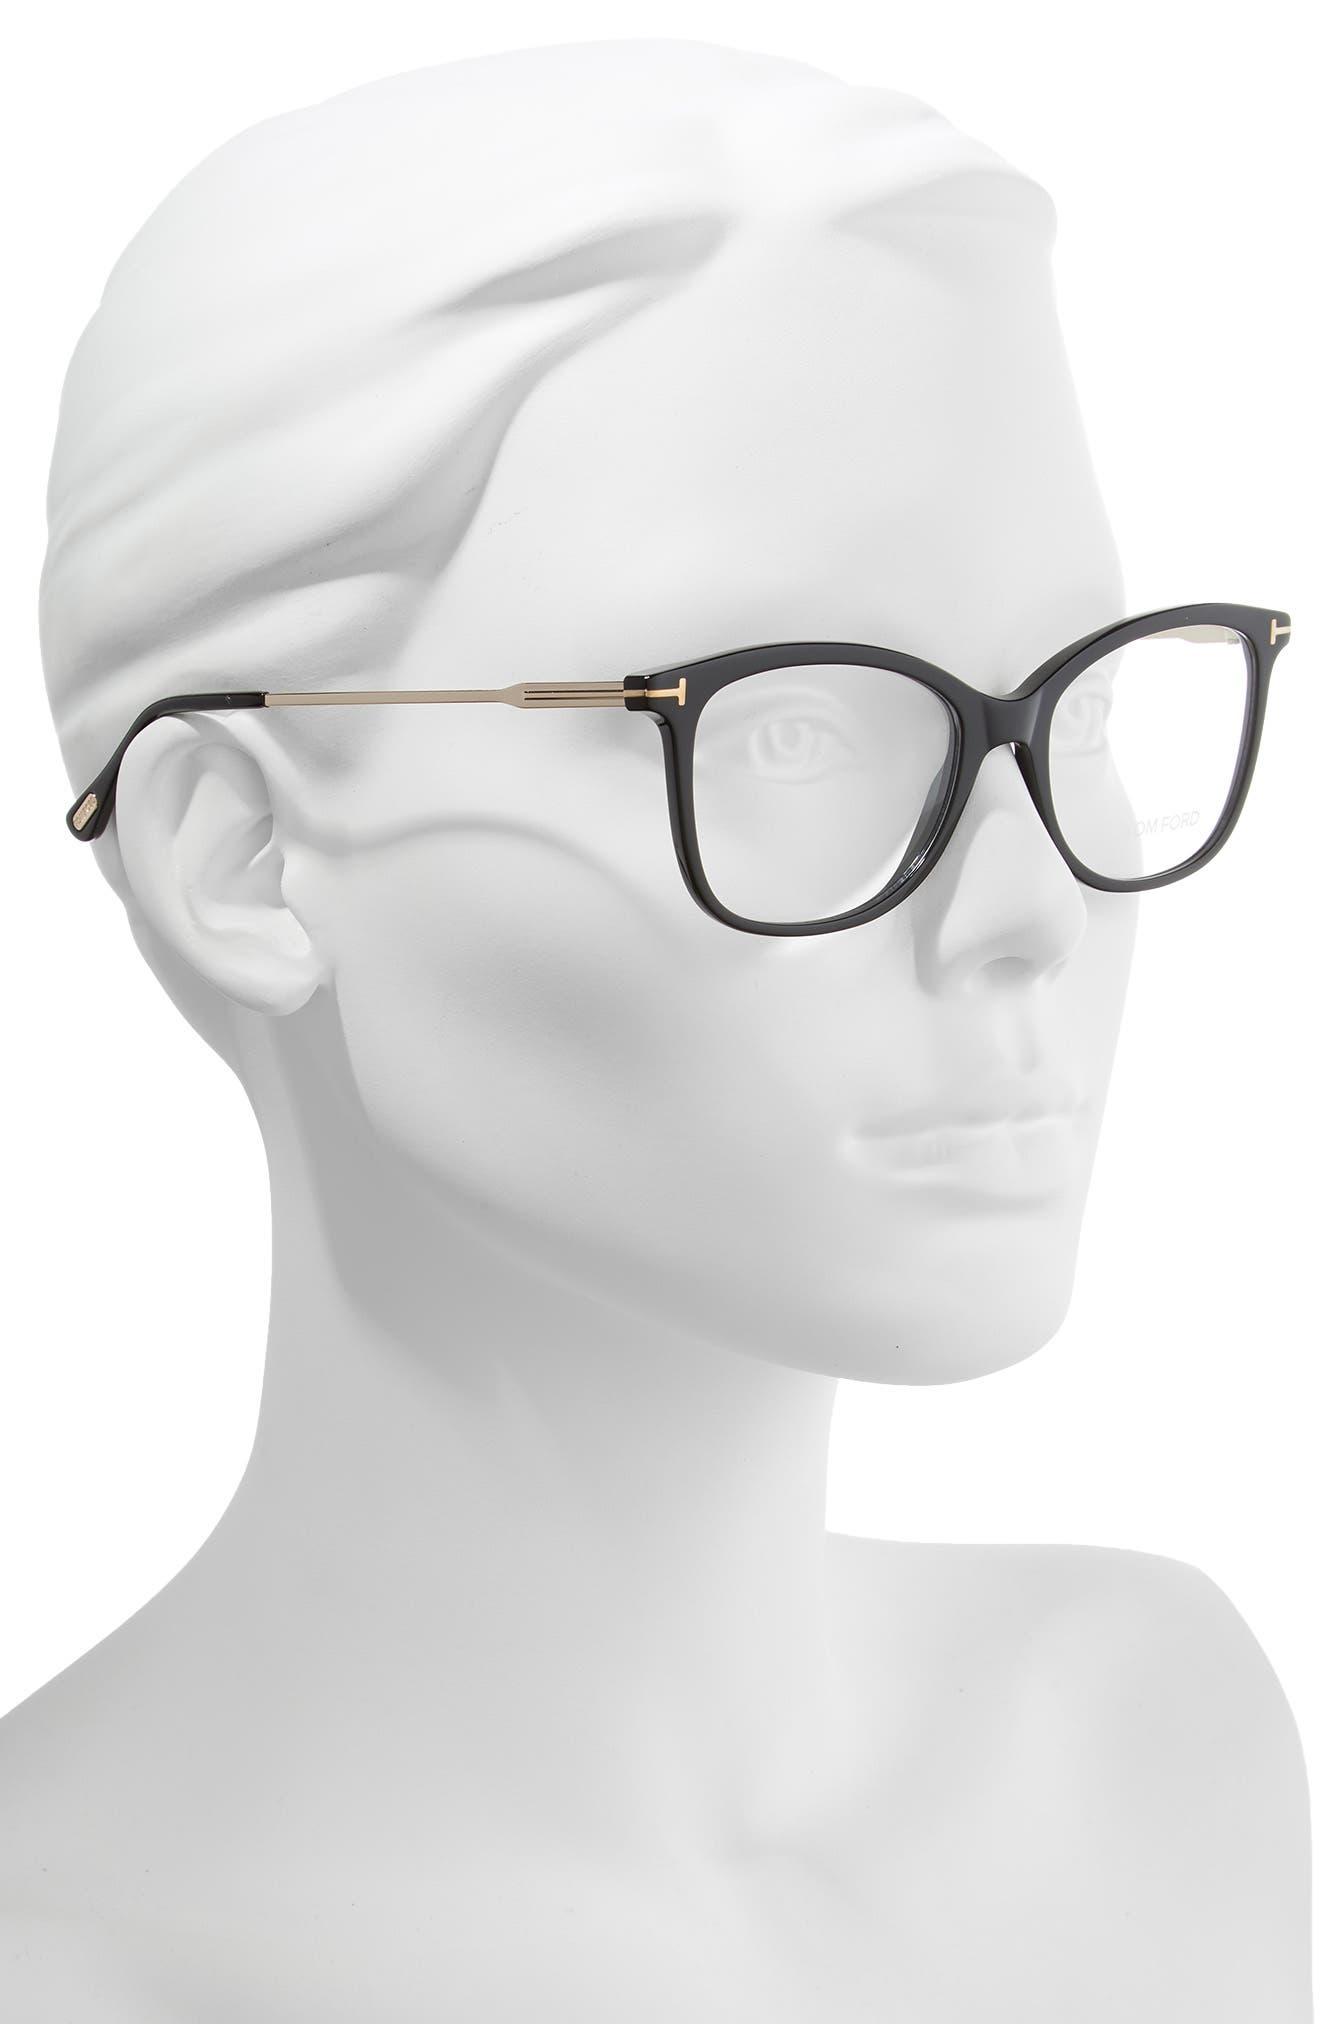 52mm Round Optical Glasses,                             Alternate thumbnail 2, color,                             SHINY BLACK ACETATE